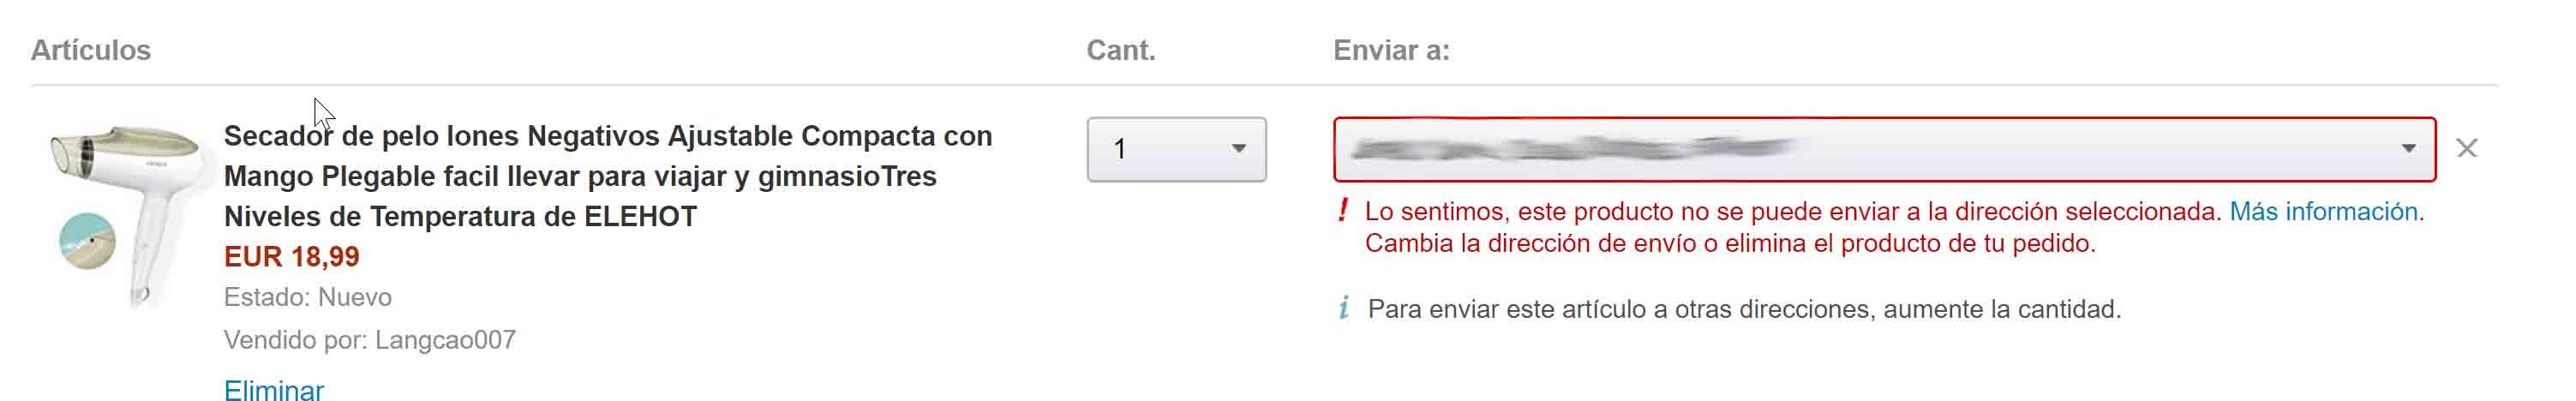 Amazon Spain won't ship hairdryer